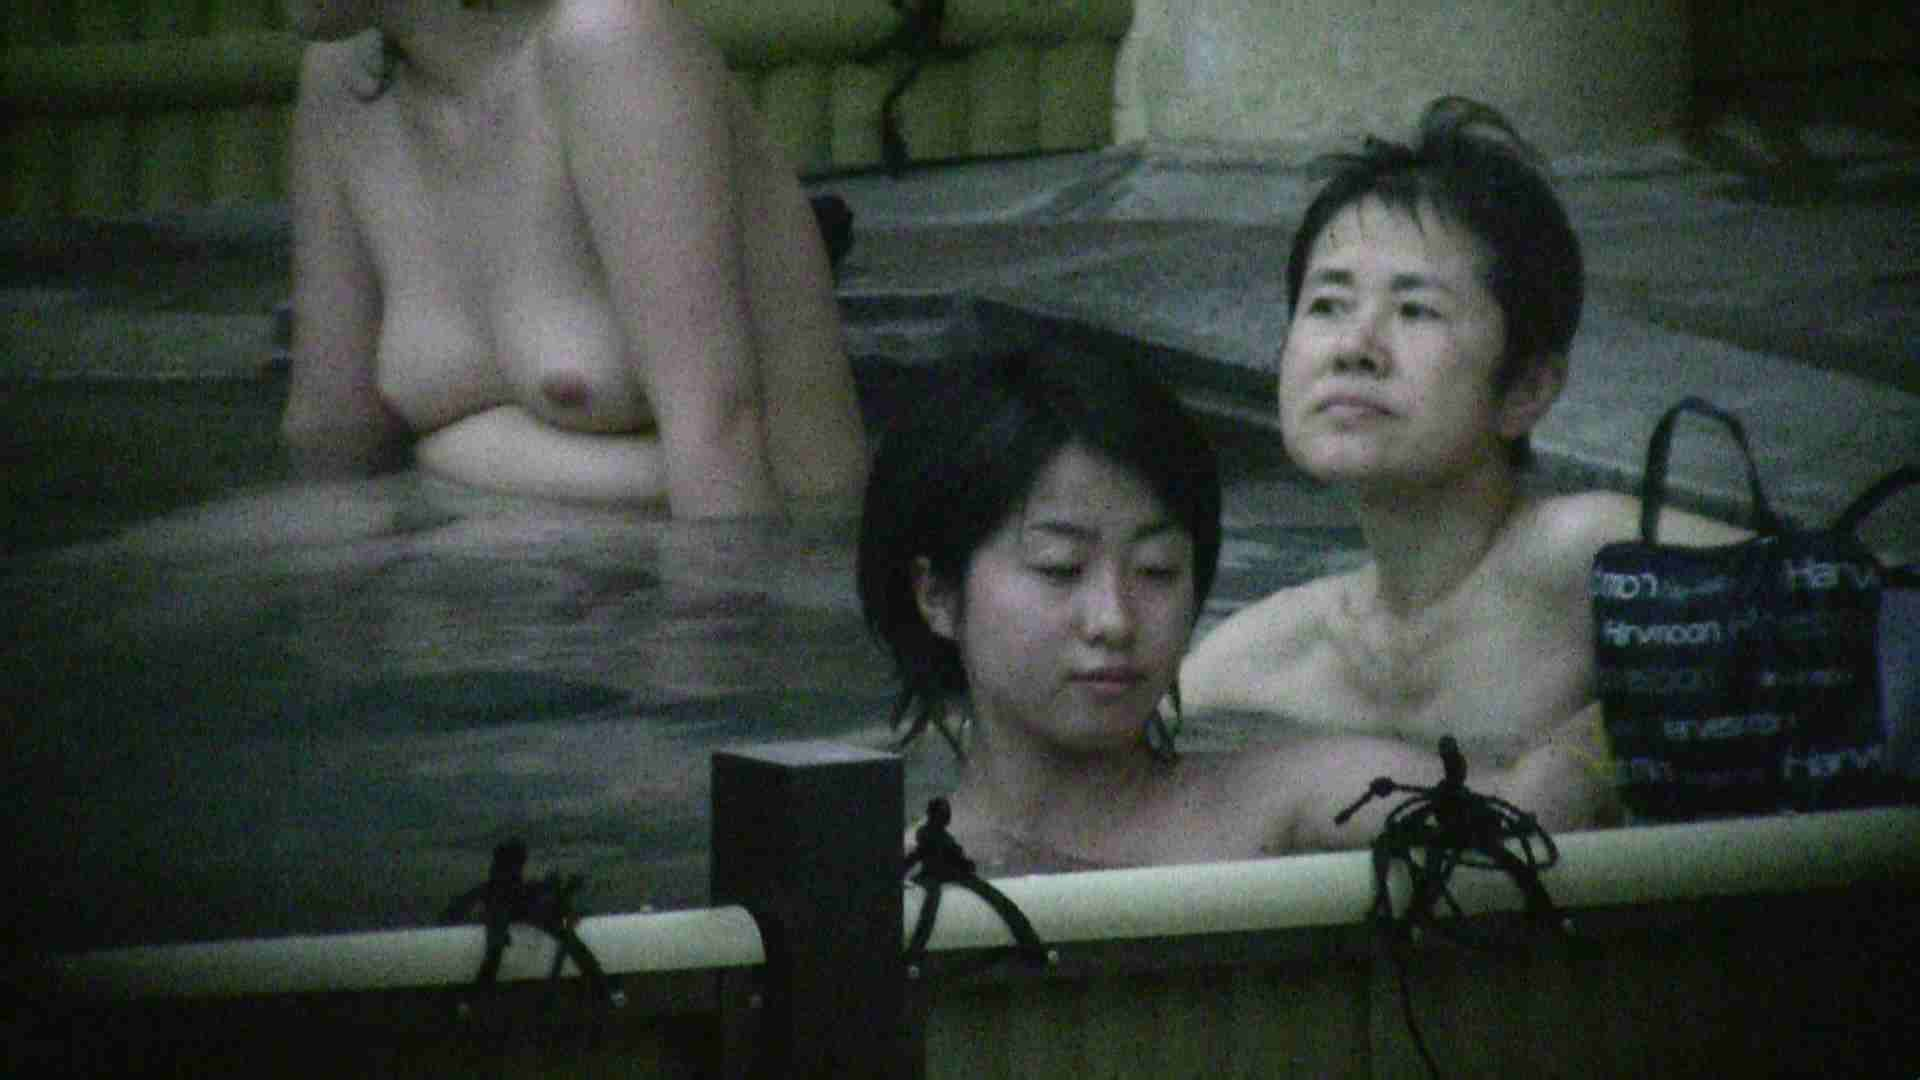 Aquaな露天風呂Vol.112 盗撮 AV無料動画キャプチャ 26PICs 2